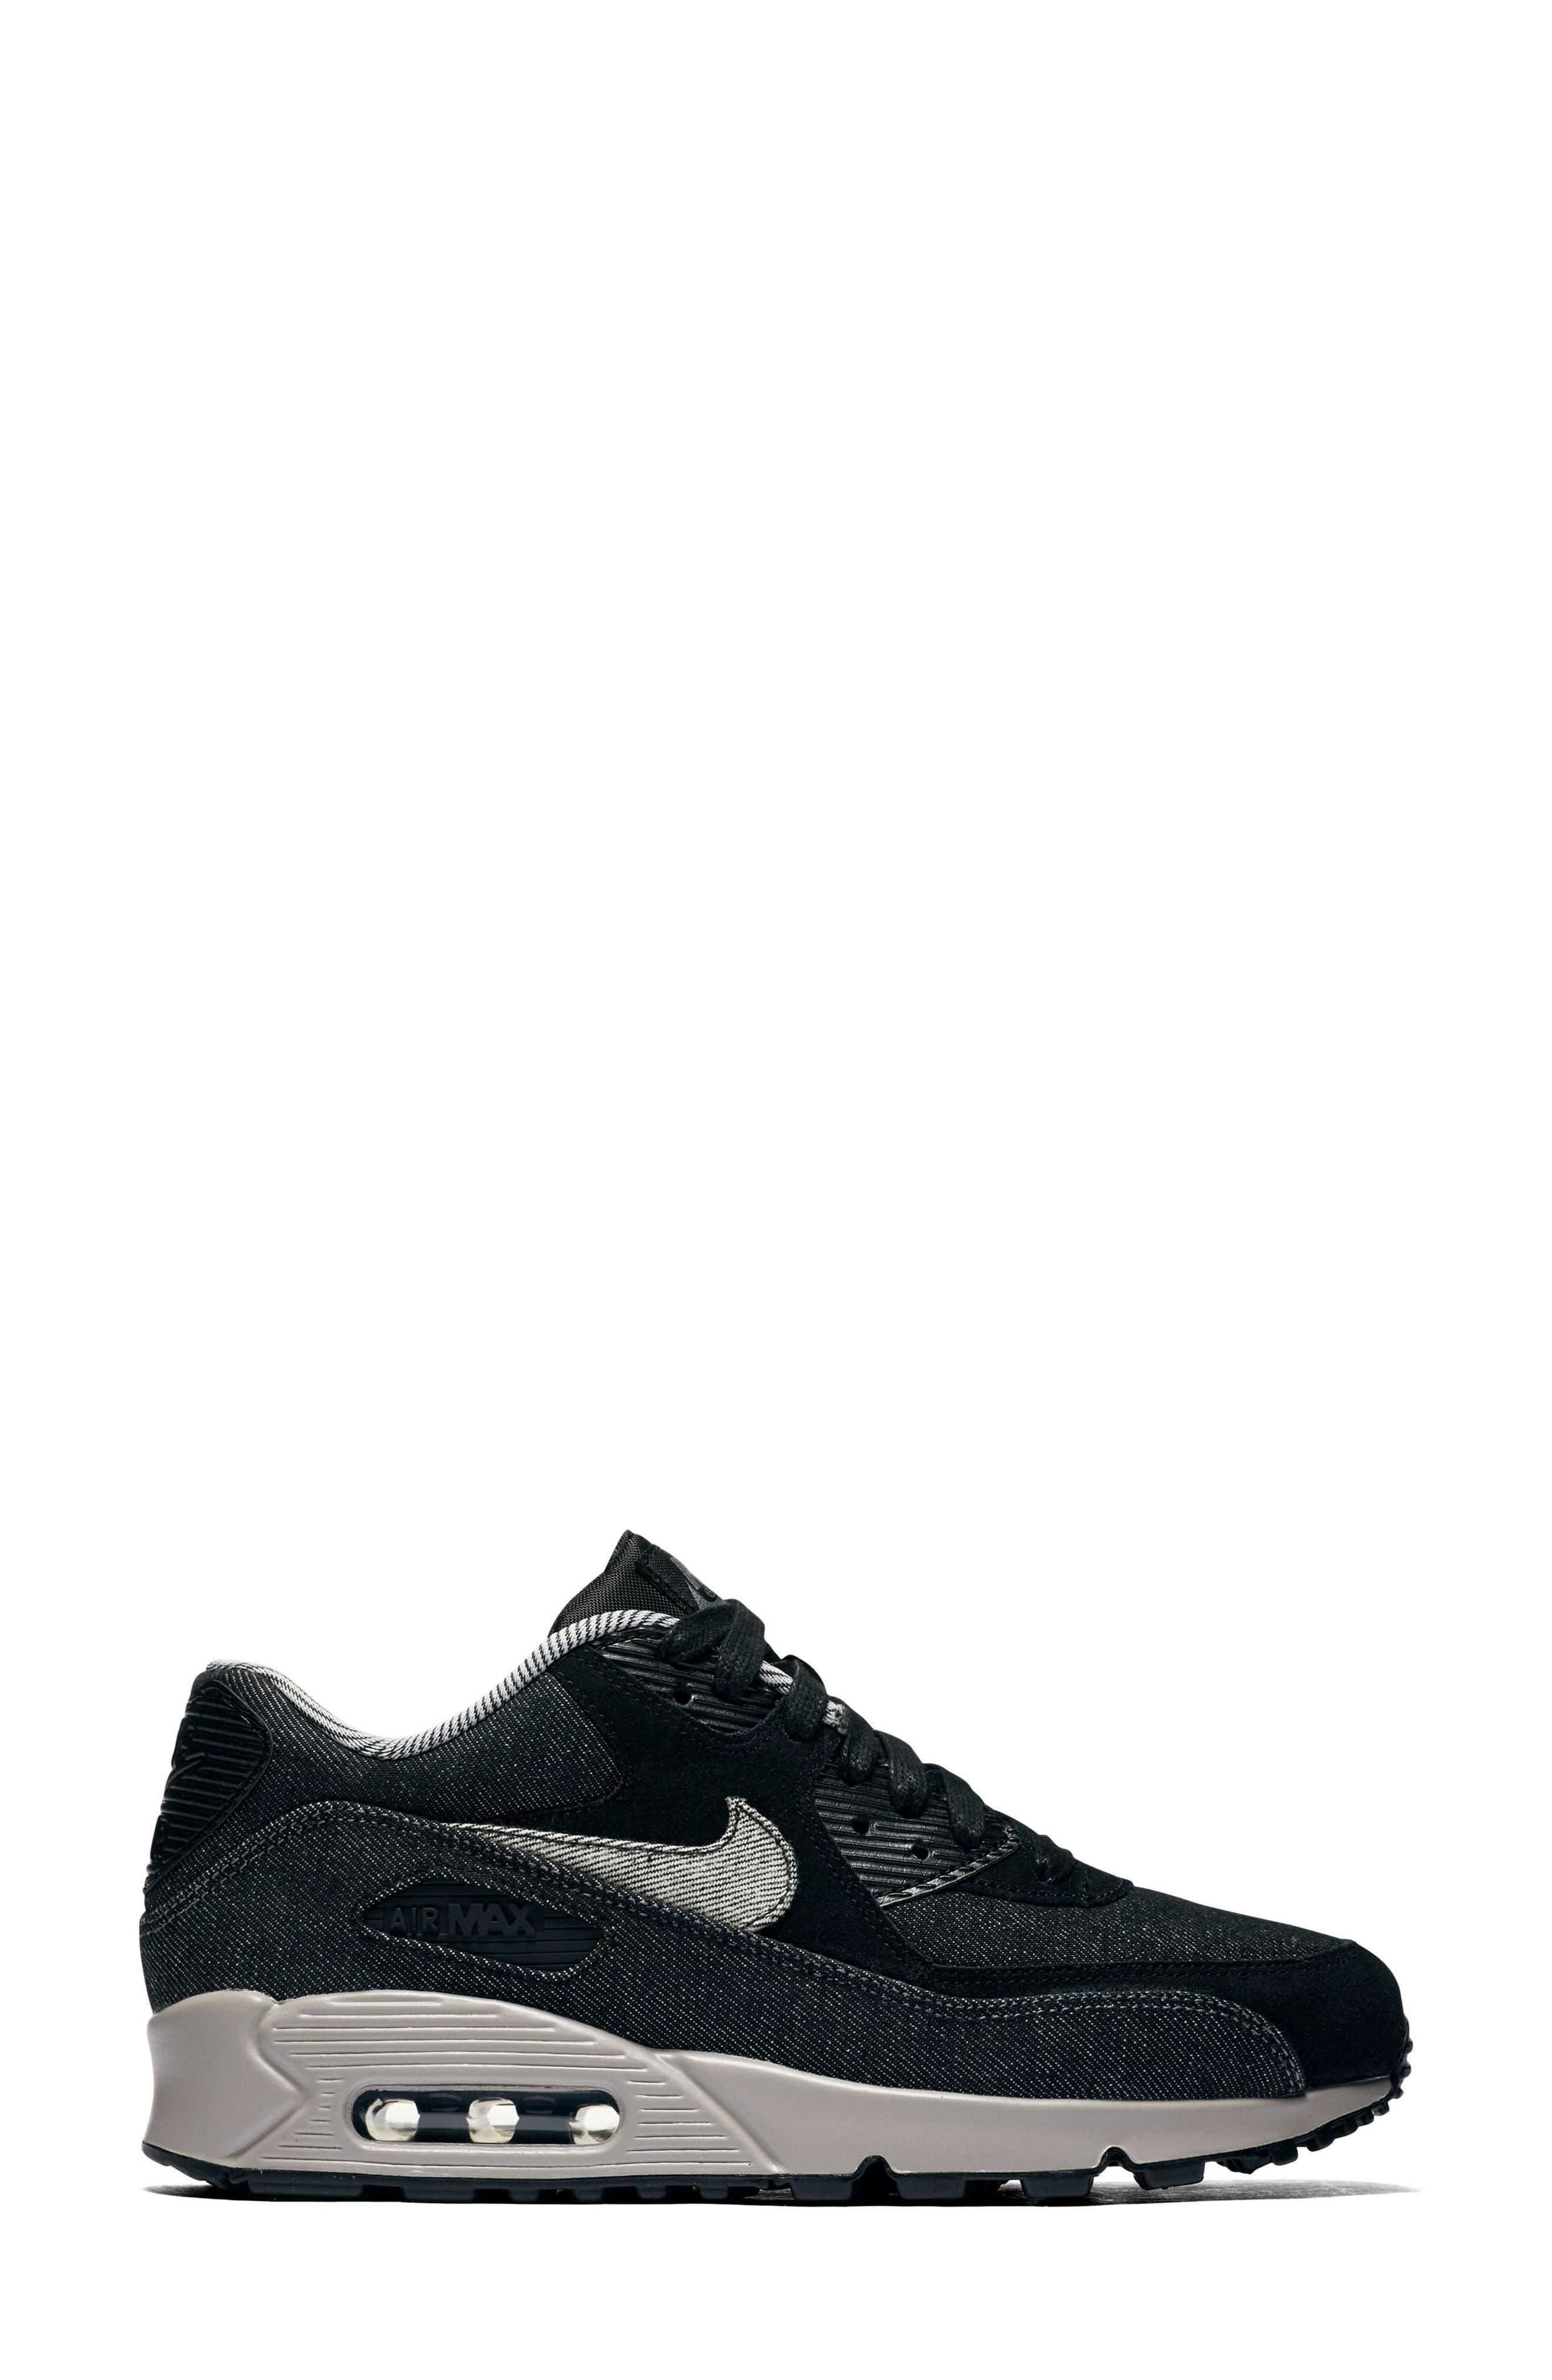 Air Max 90 SE Sneaker,                             Alternate thumbnail 23, color,